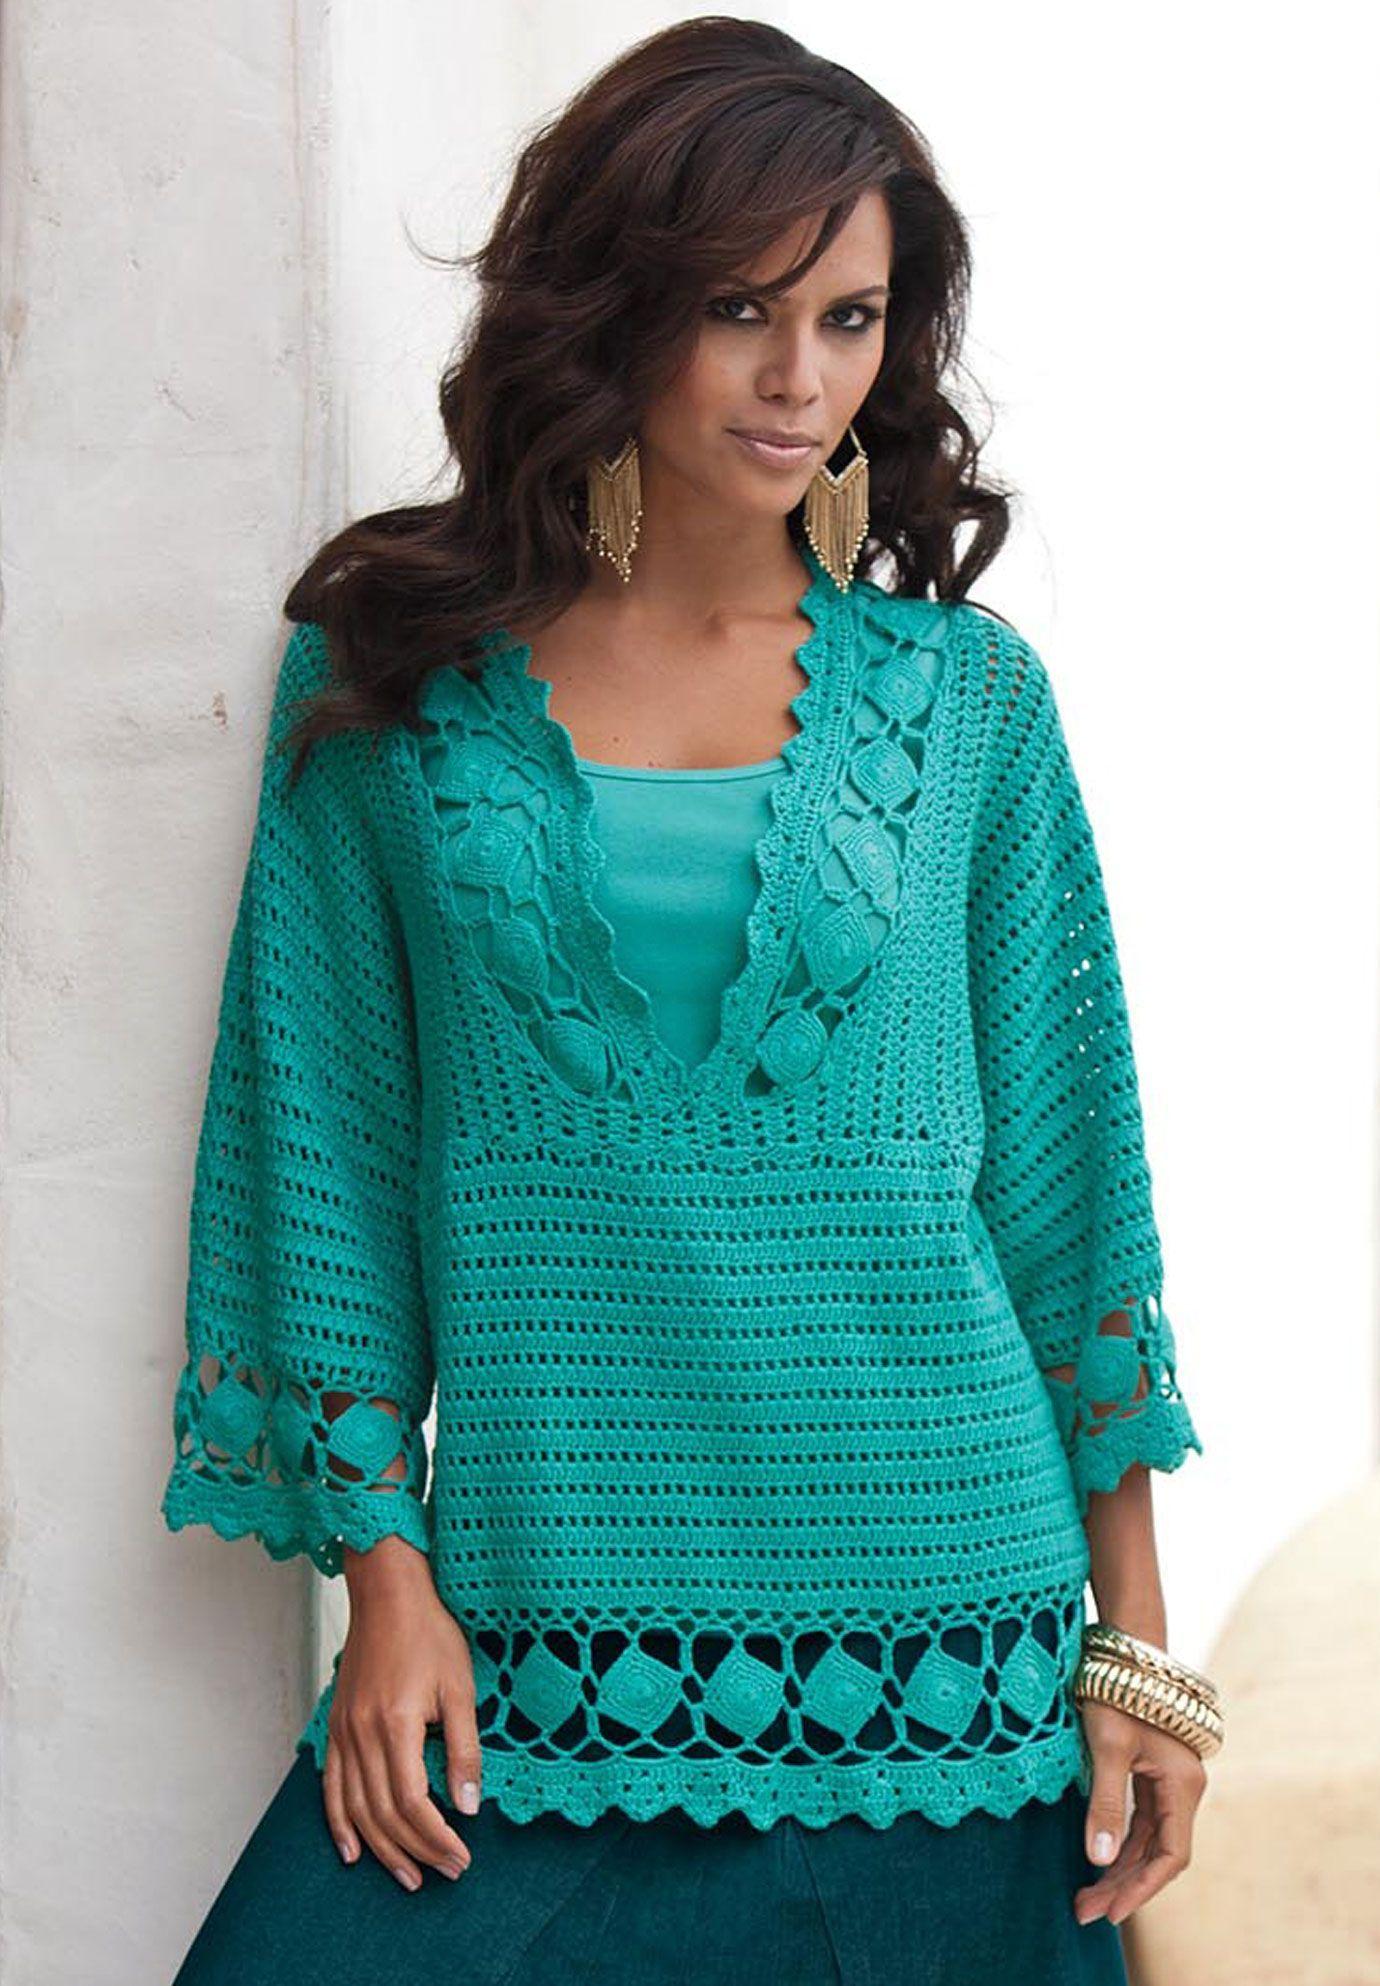 ff94cb77ecc1d Plus Size Crochet V-neck Tunic by Denim 24 7